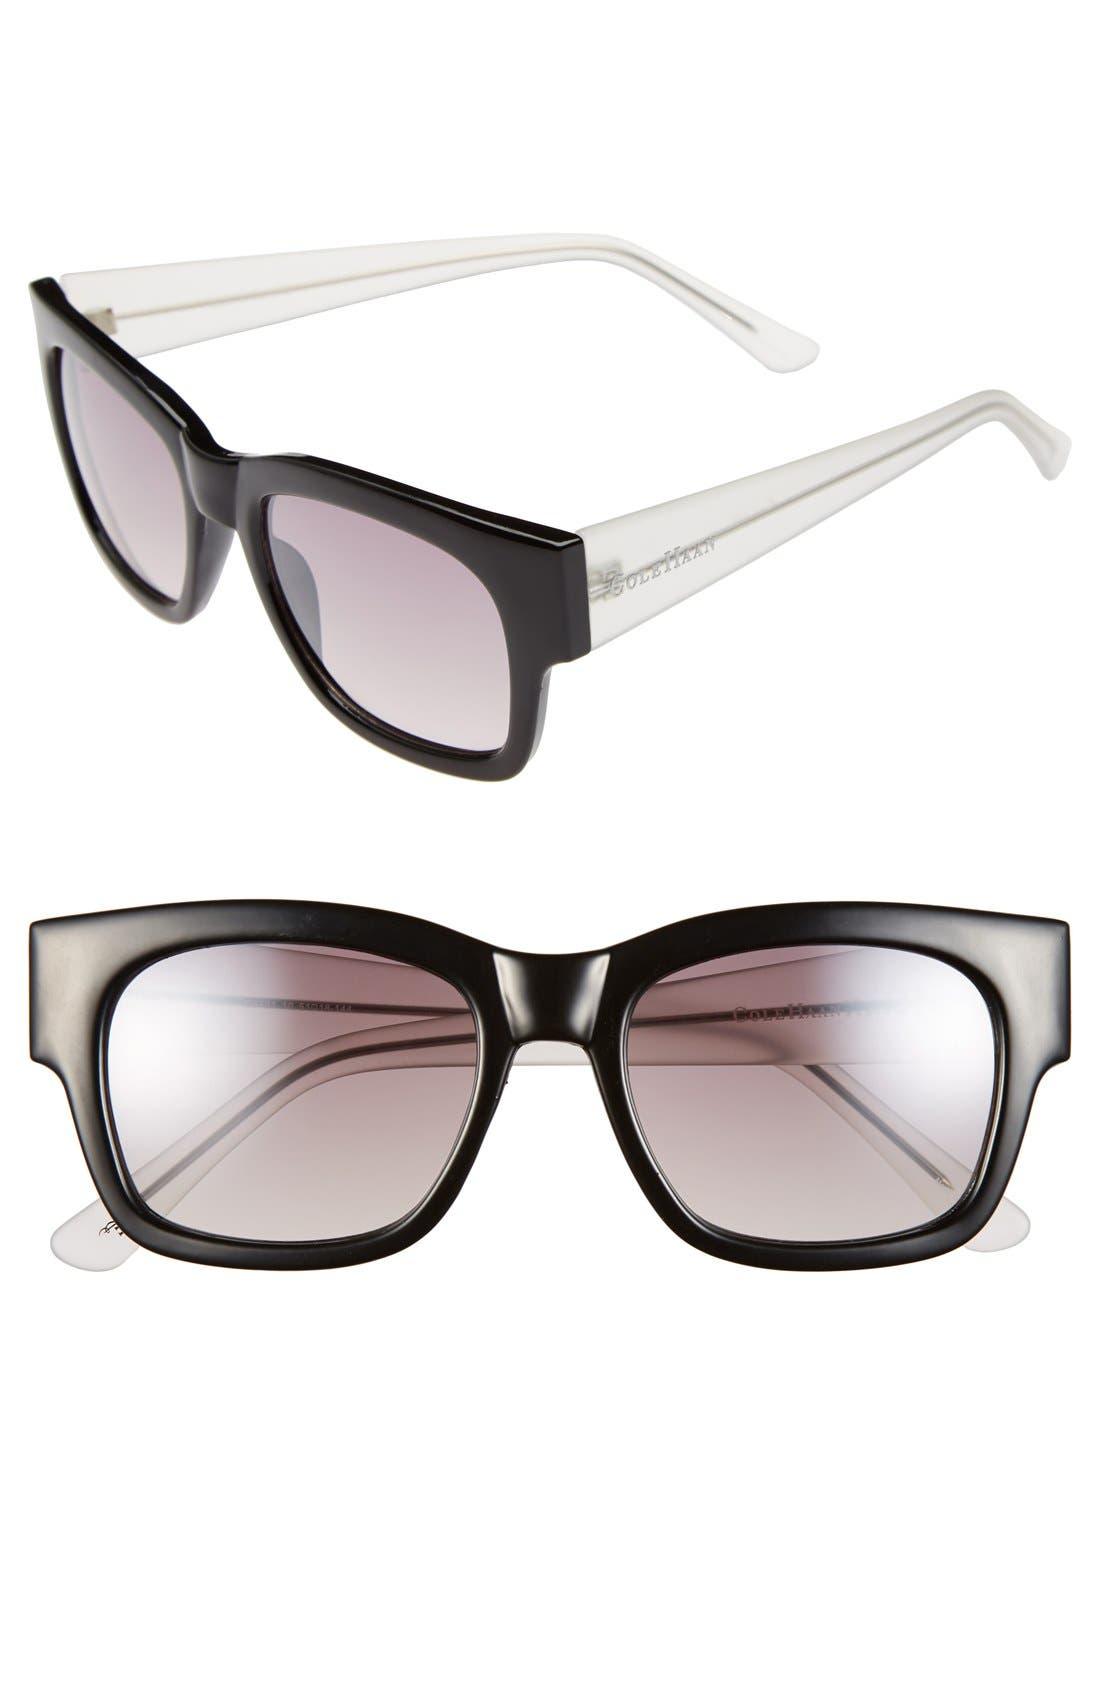 51mm Rectangular Sunglasses,                             Main thumbnail 1, color,                             001